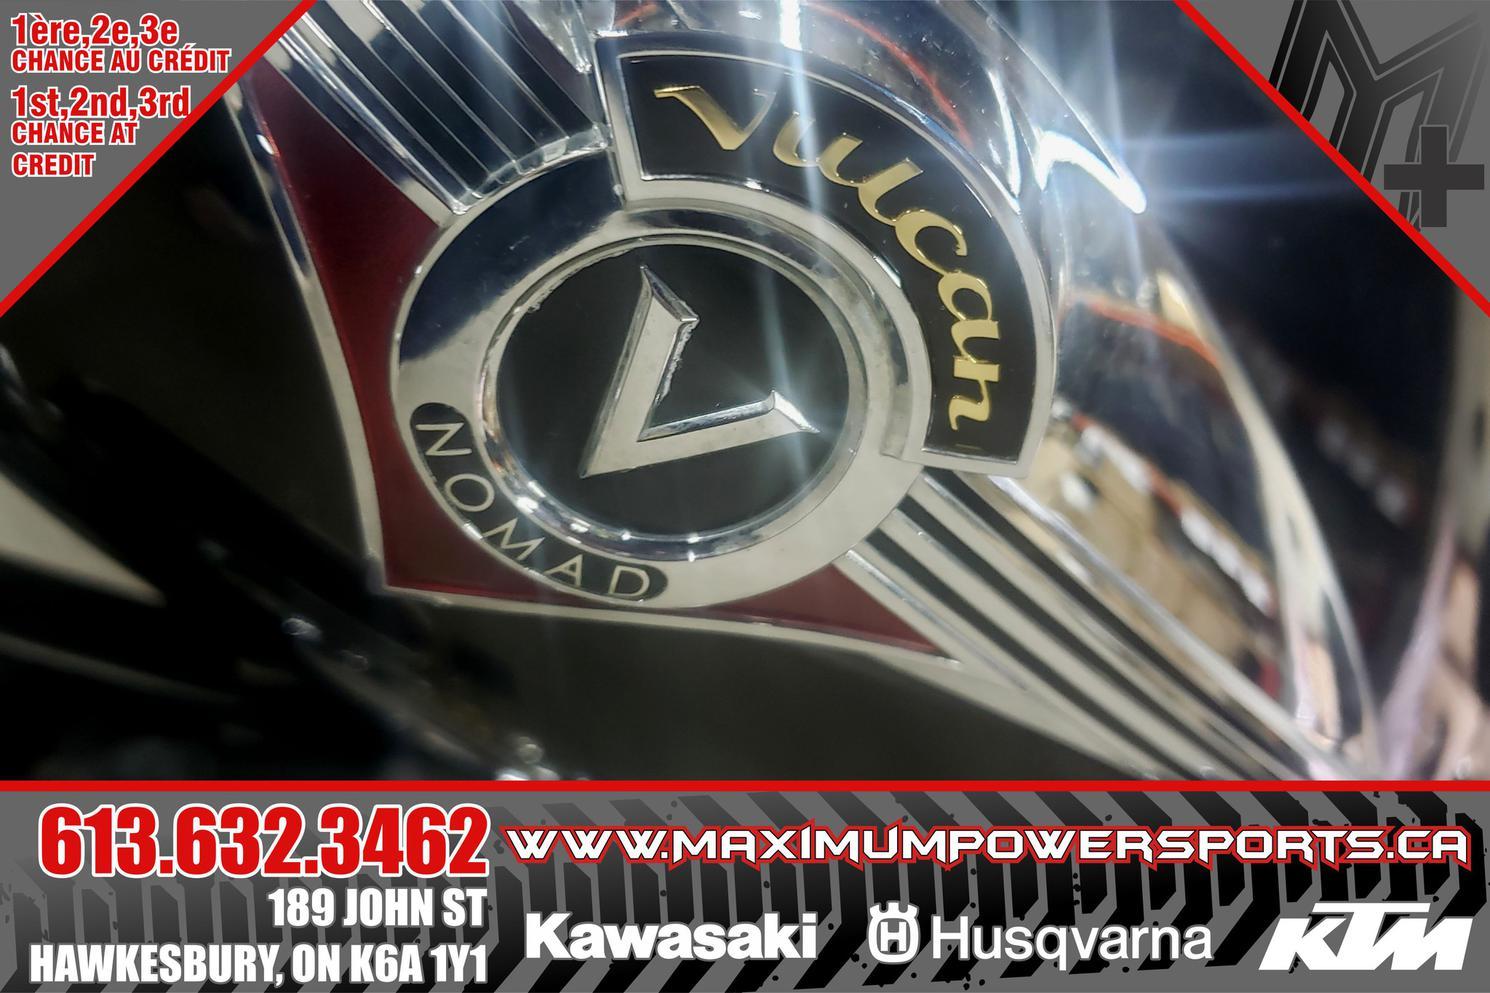 2003 Kawasaki NOMAD 1600 NOMAD 1600